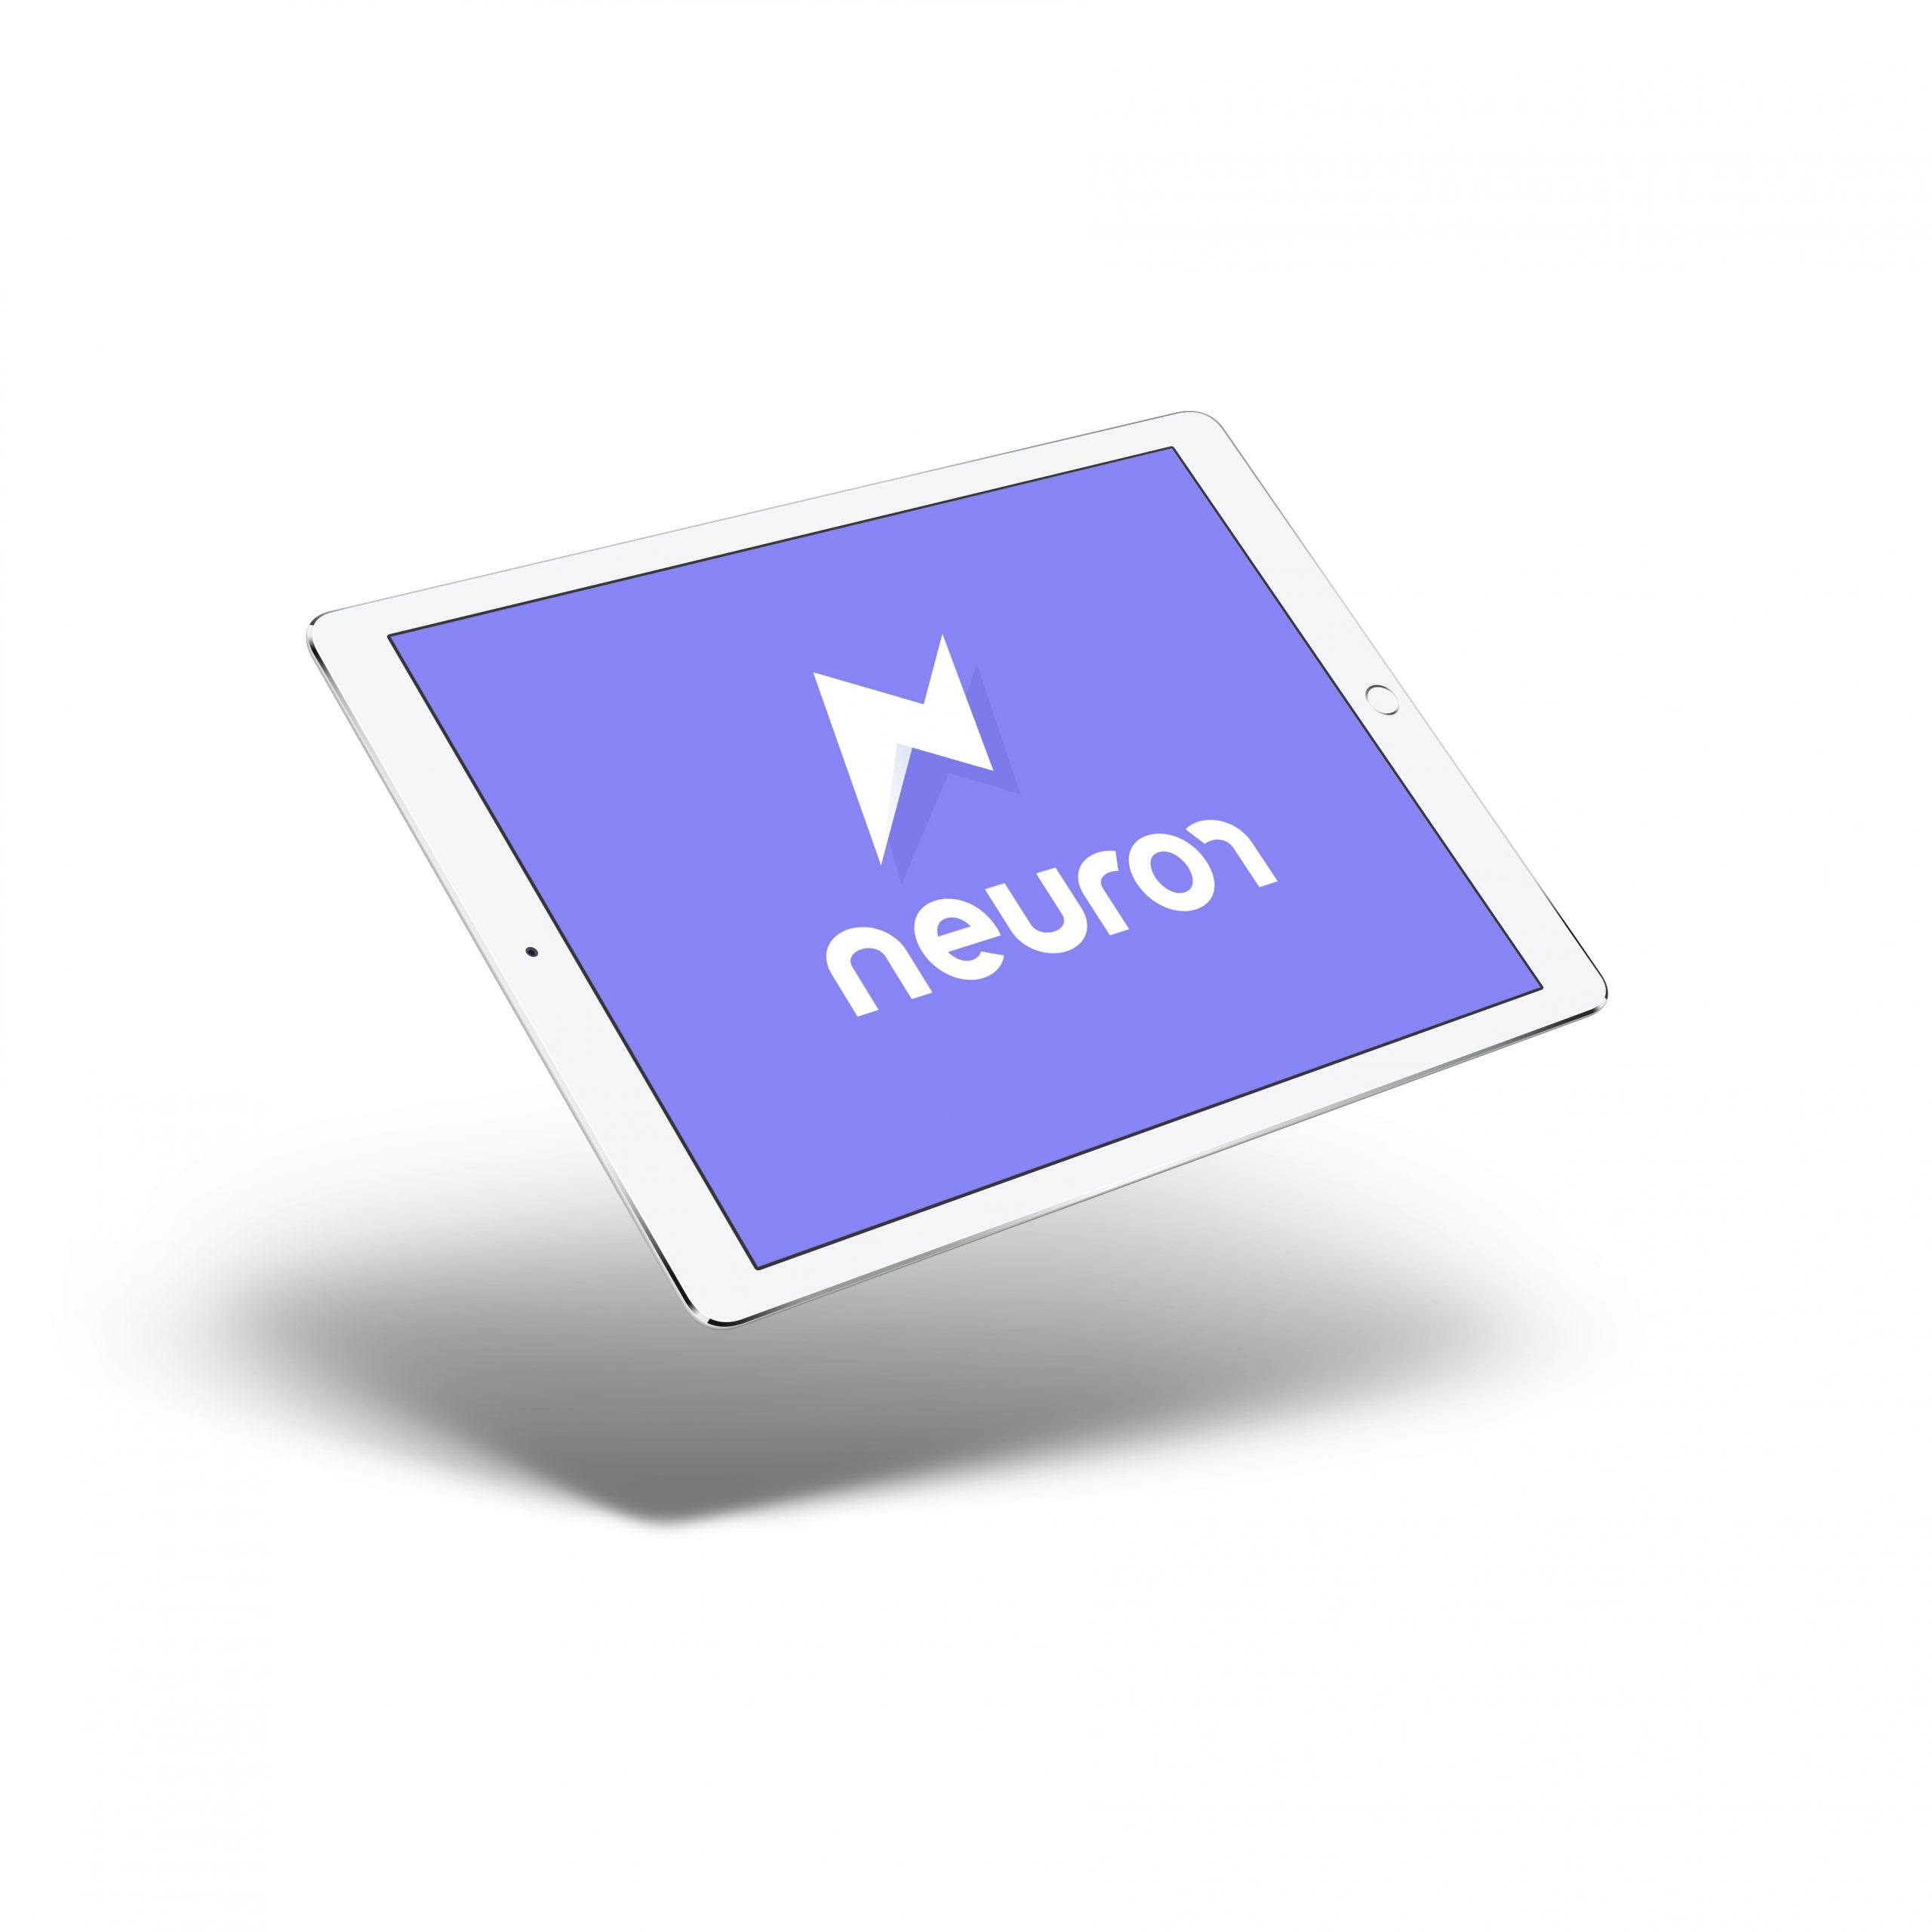 neuron_landscape_600x600_v2-2